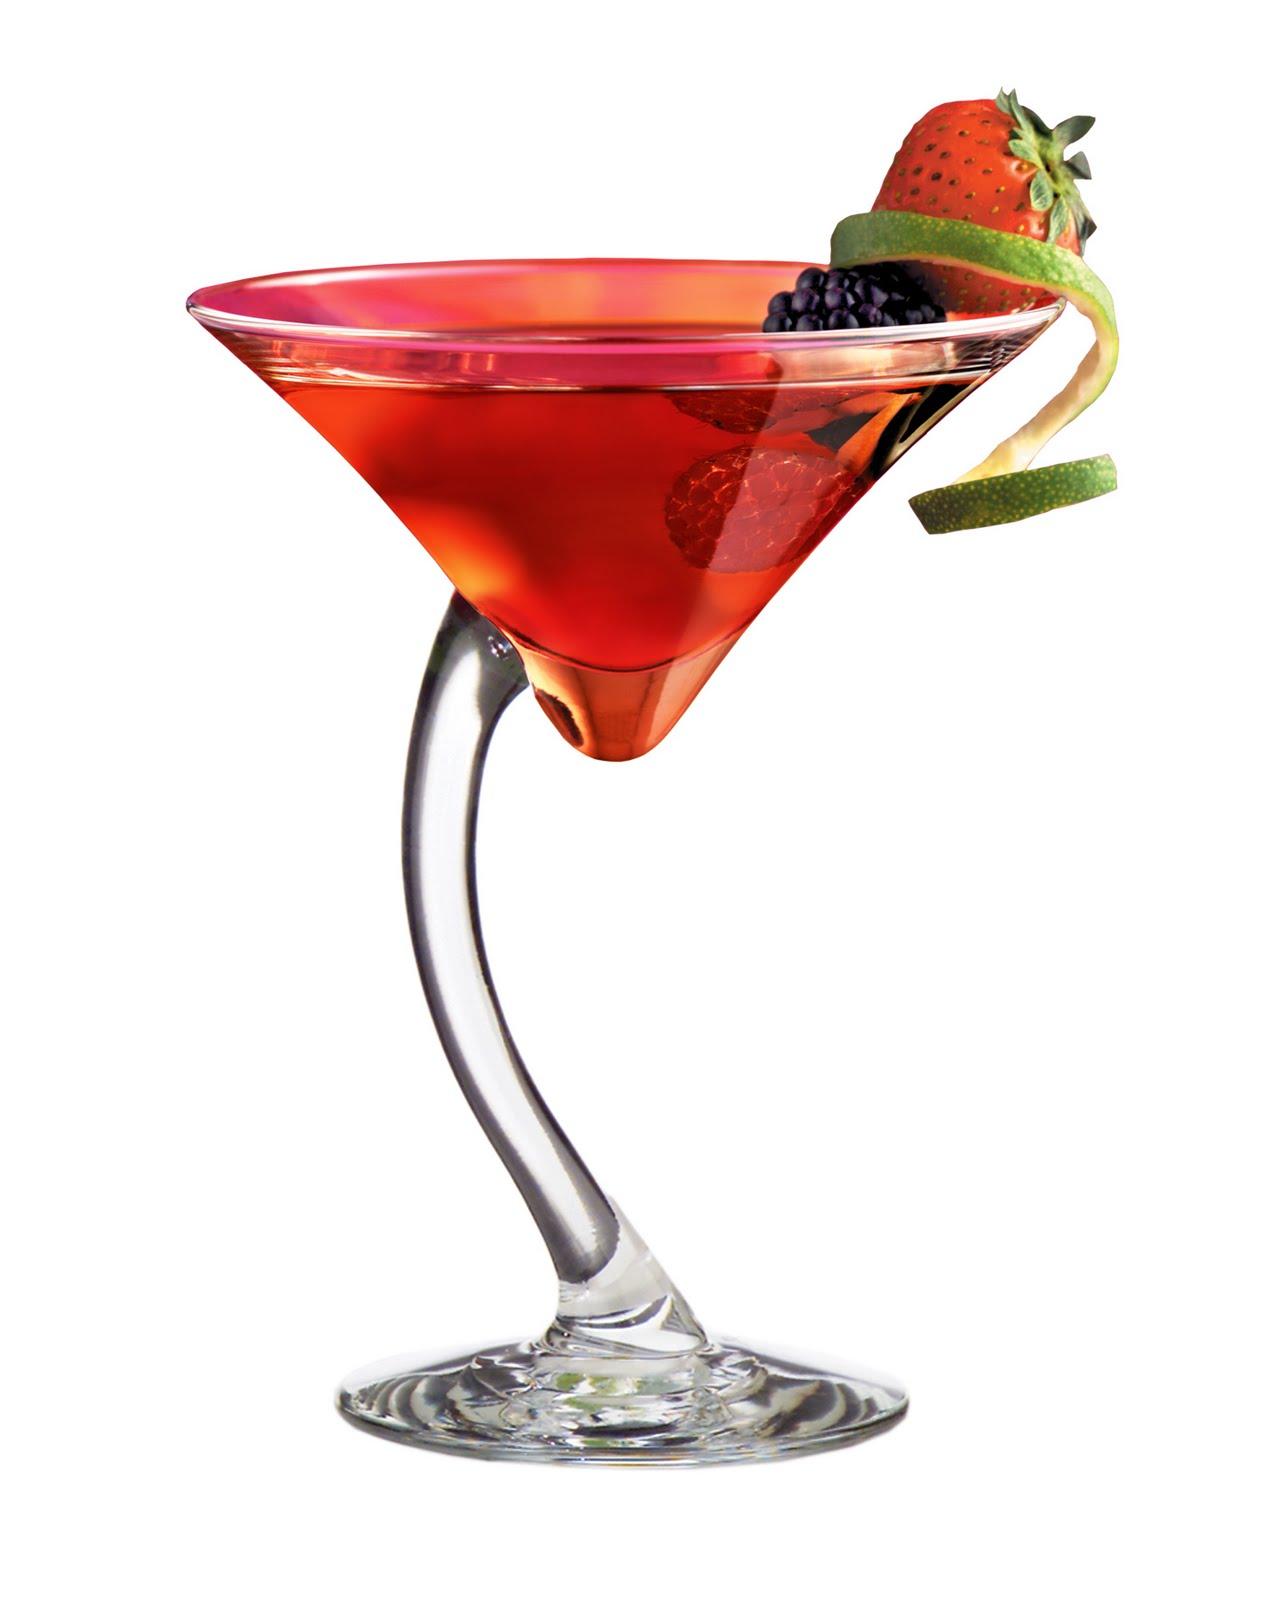 WORLD OF LIQUOR: Cocktails